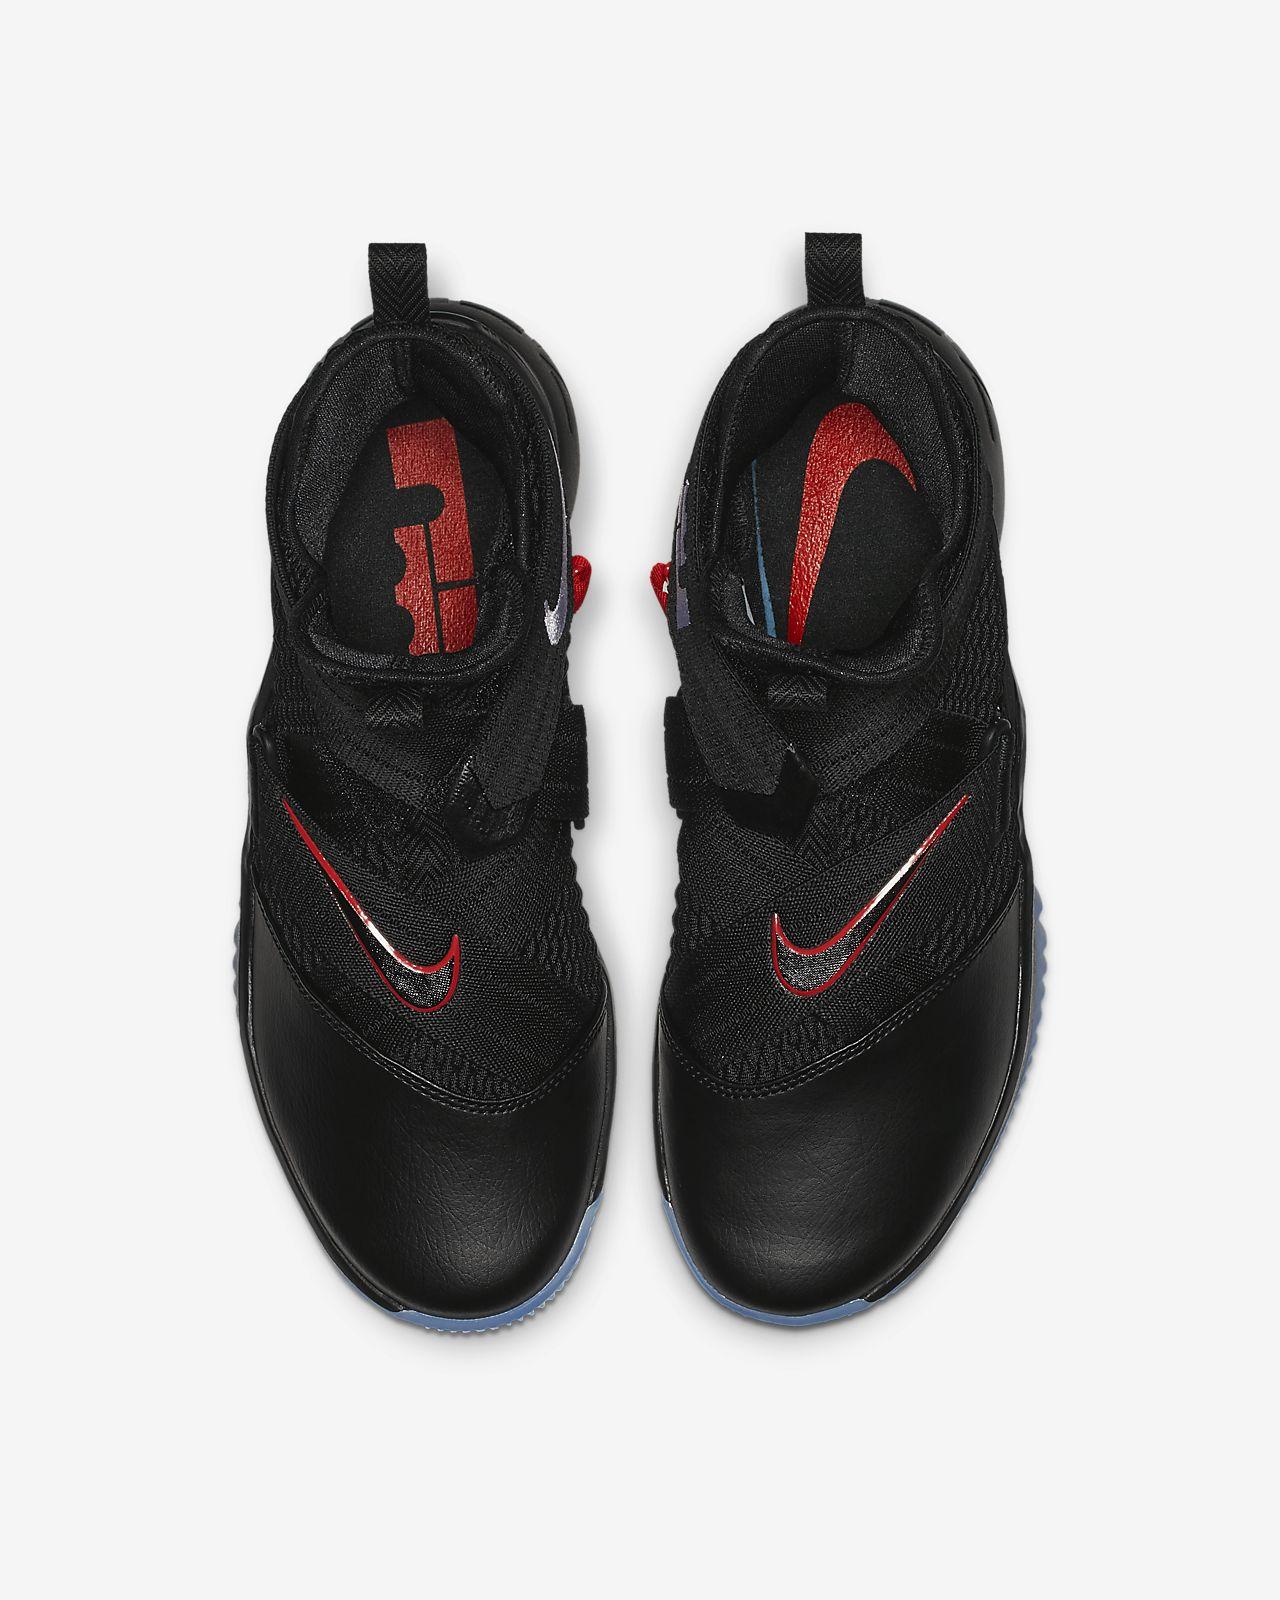 3c40c6eff05 LeBron Soldier 12 FlyEase Men s Basketball Shoe. Nike.com CA